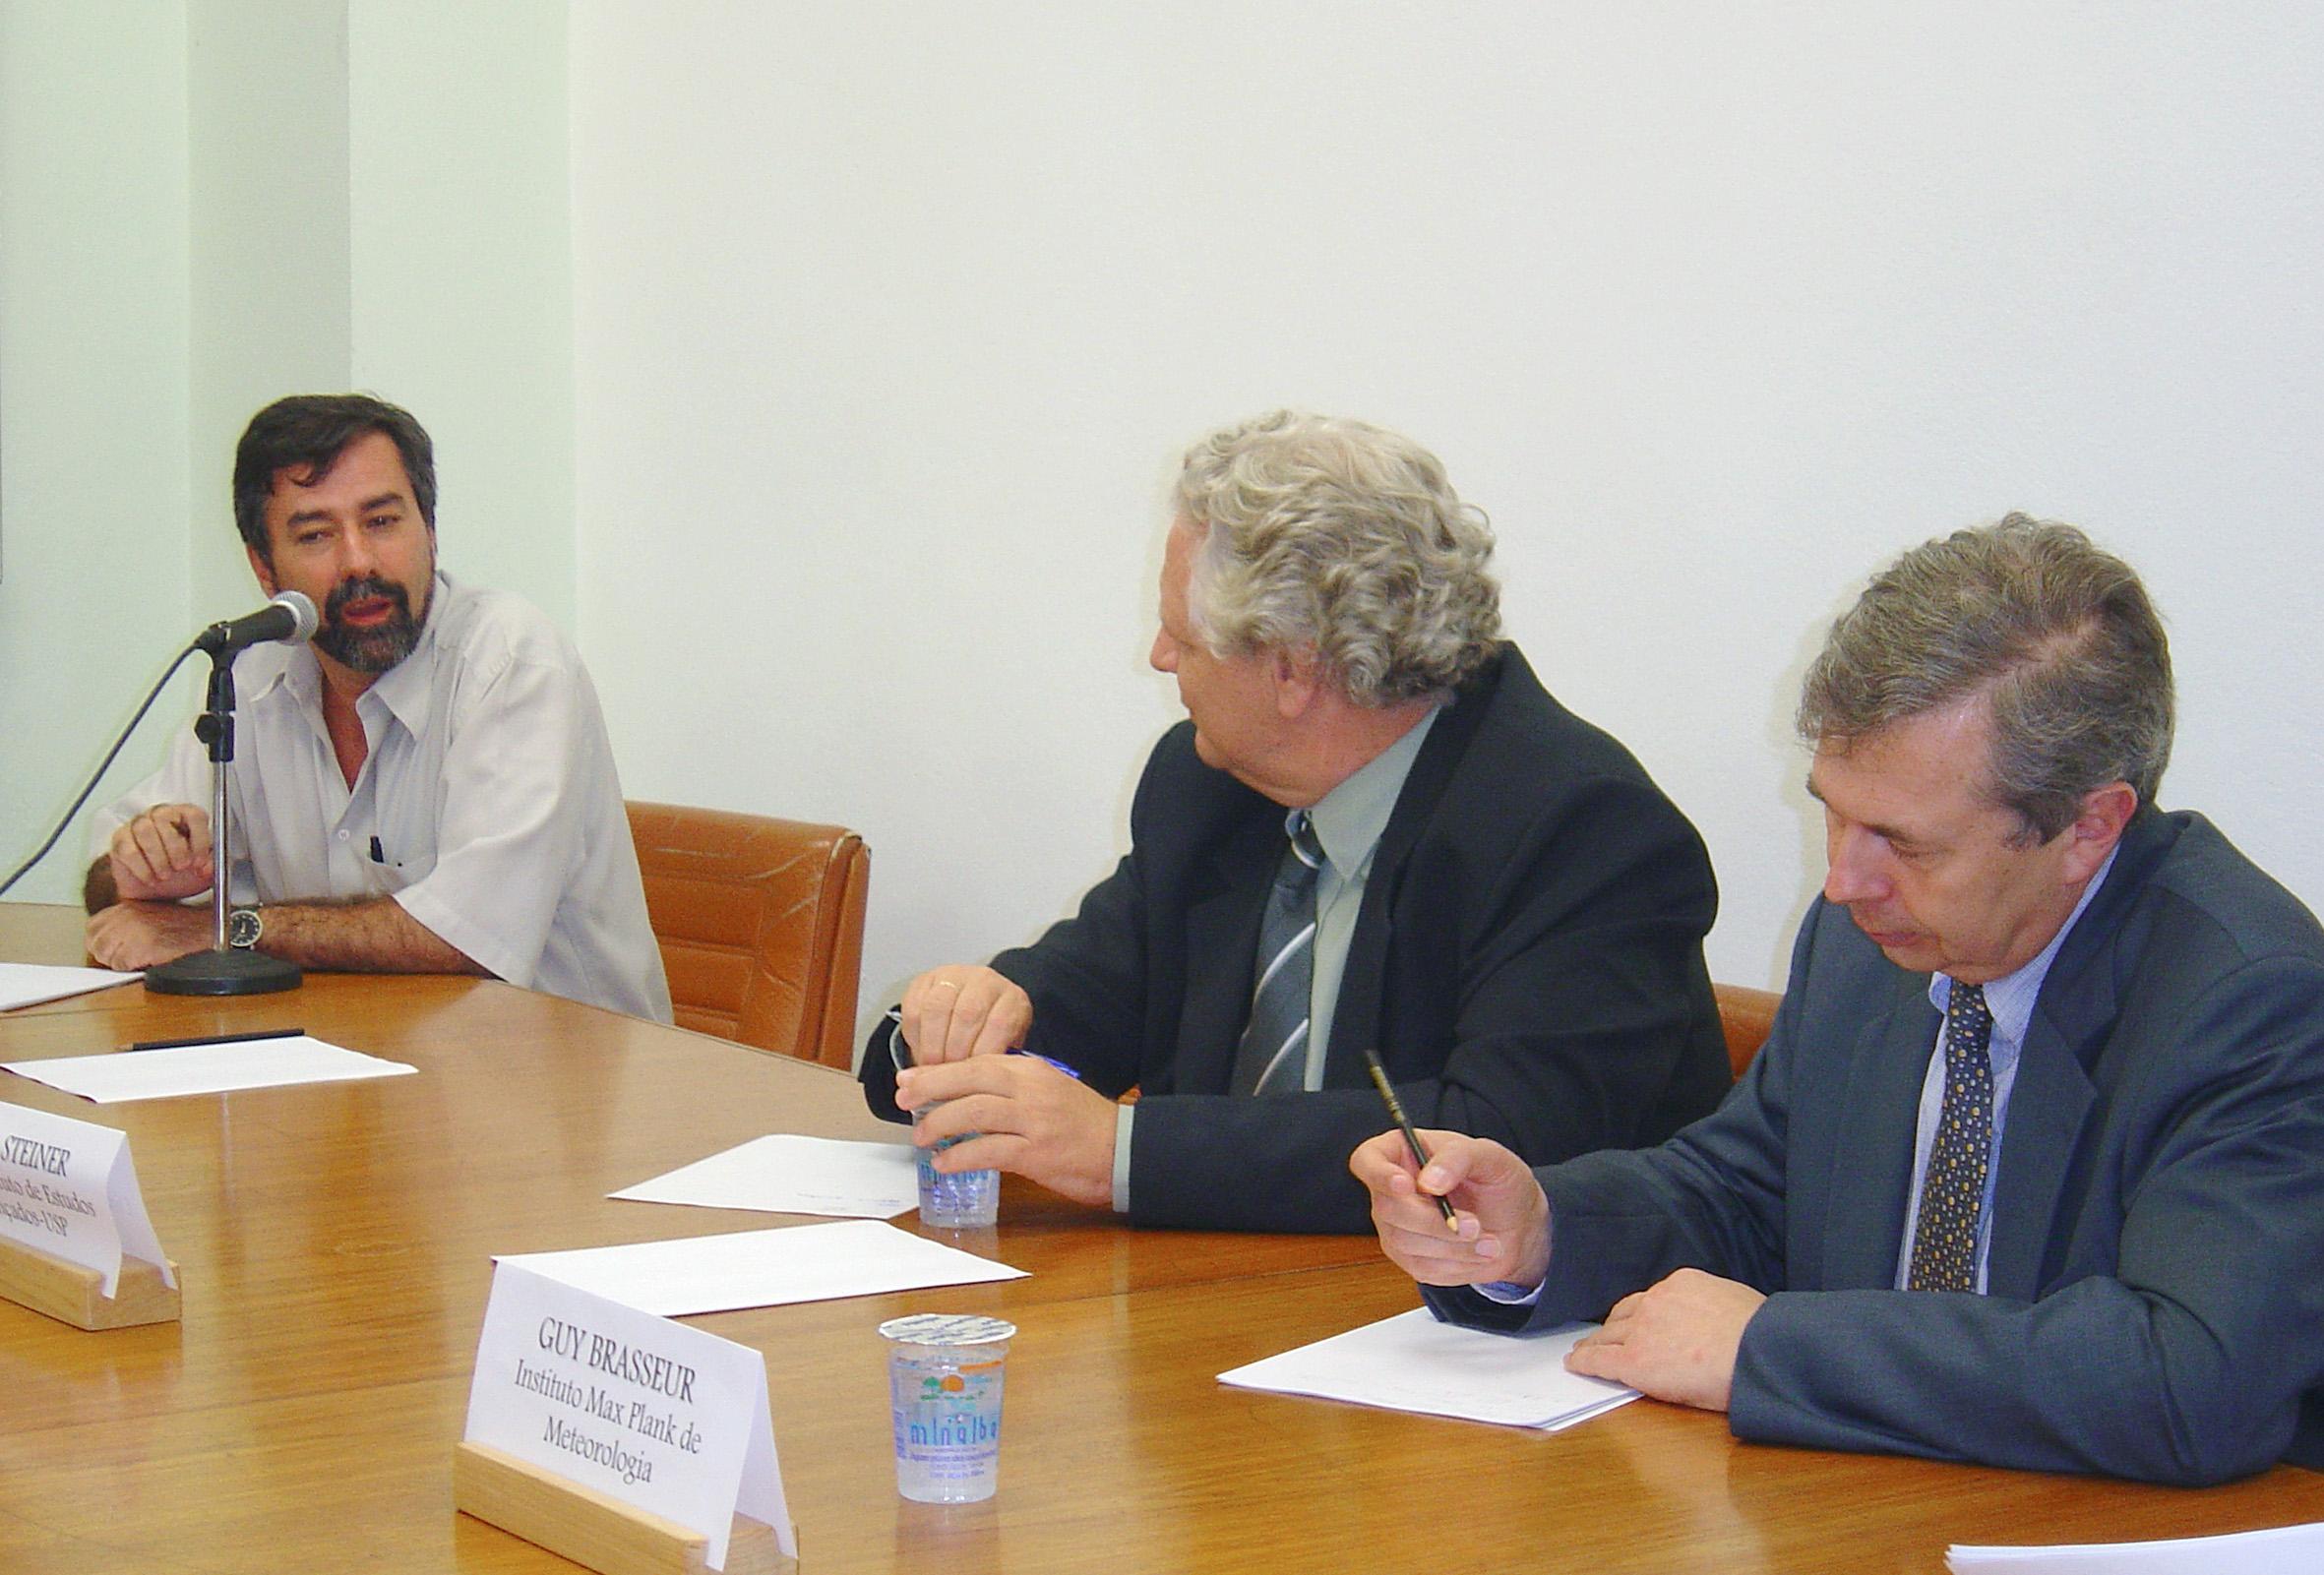 Paulo Artaxo, João Steiner e Guy Brasseur